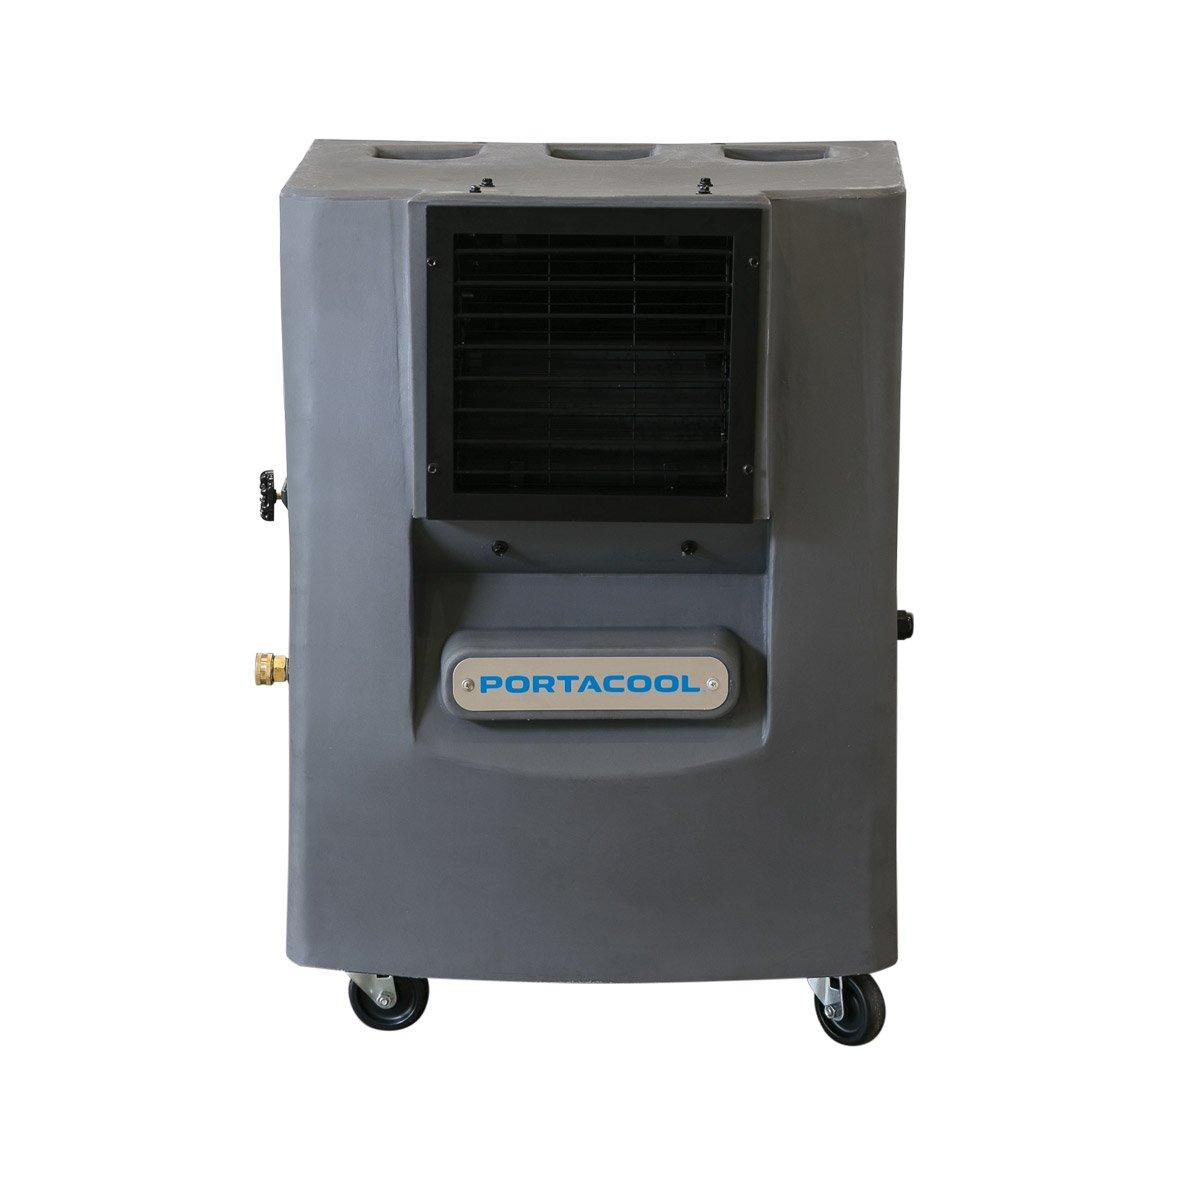 Portacool PACCY120GA1 Cyclone 120 Portable Evaporative Cooler